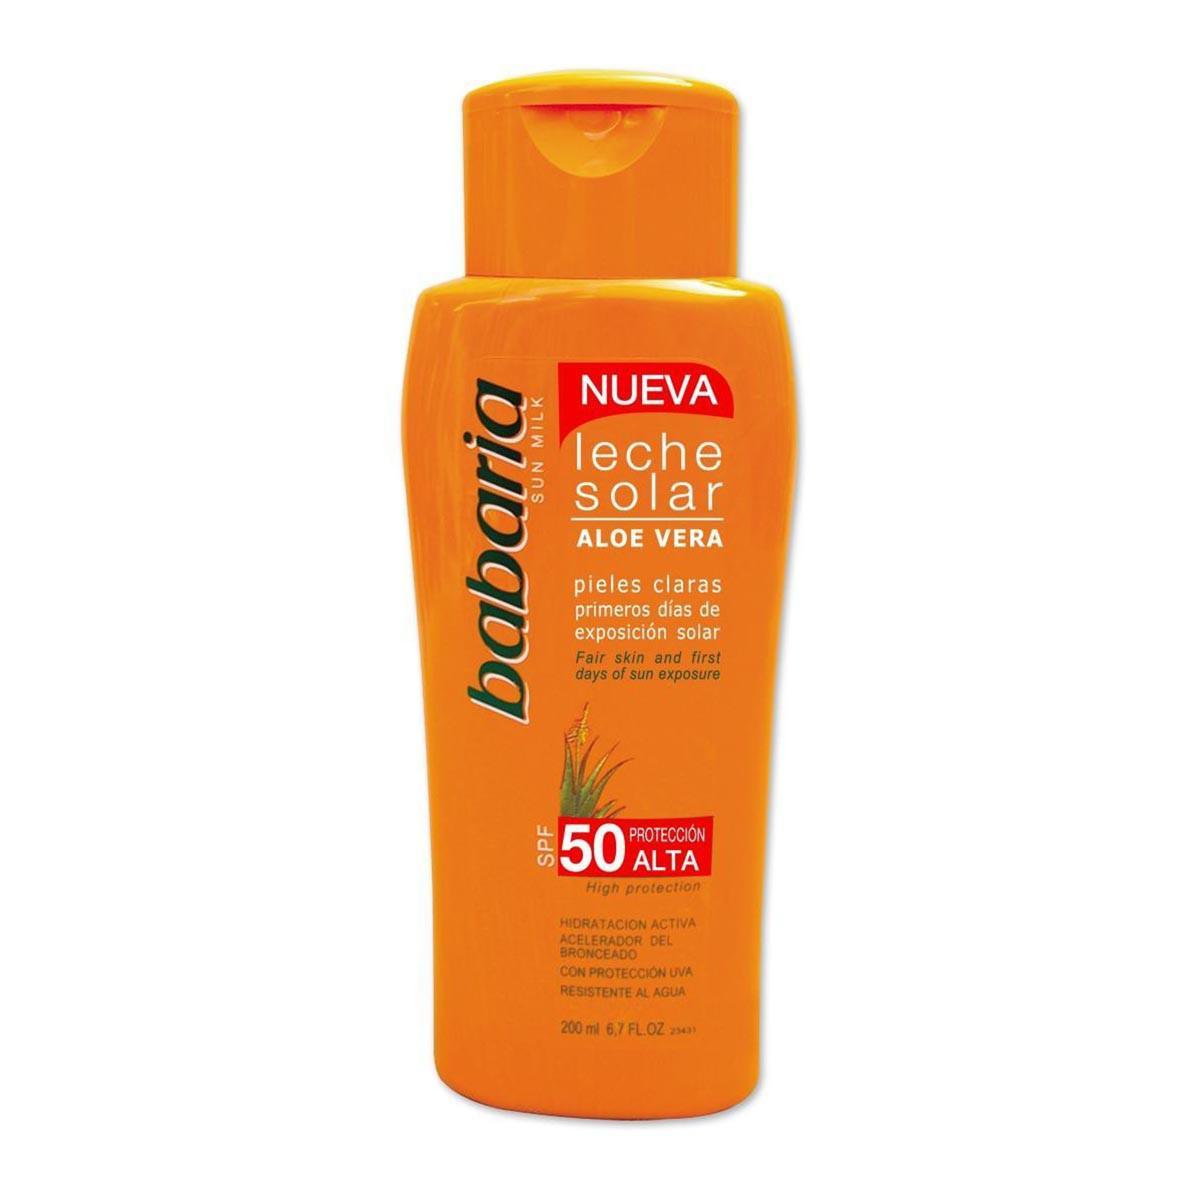 Babaria-fragrances Solar Milk Aloe Vera Clear Skin First Days Of Sun Exposure Spf50 High Protection 200ml